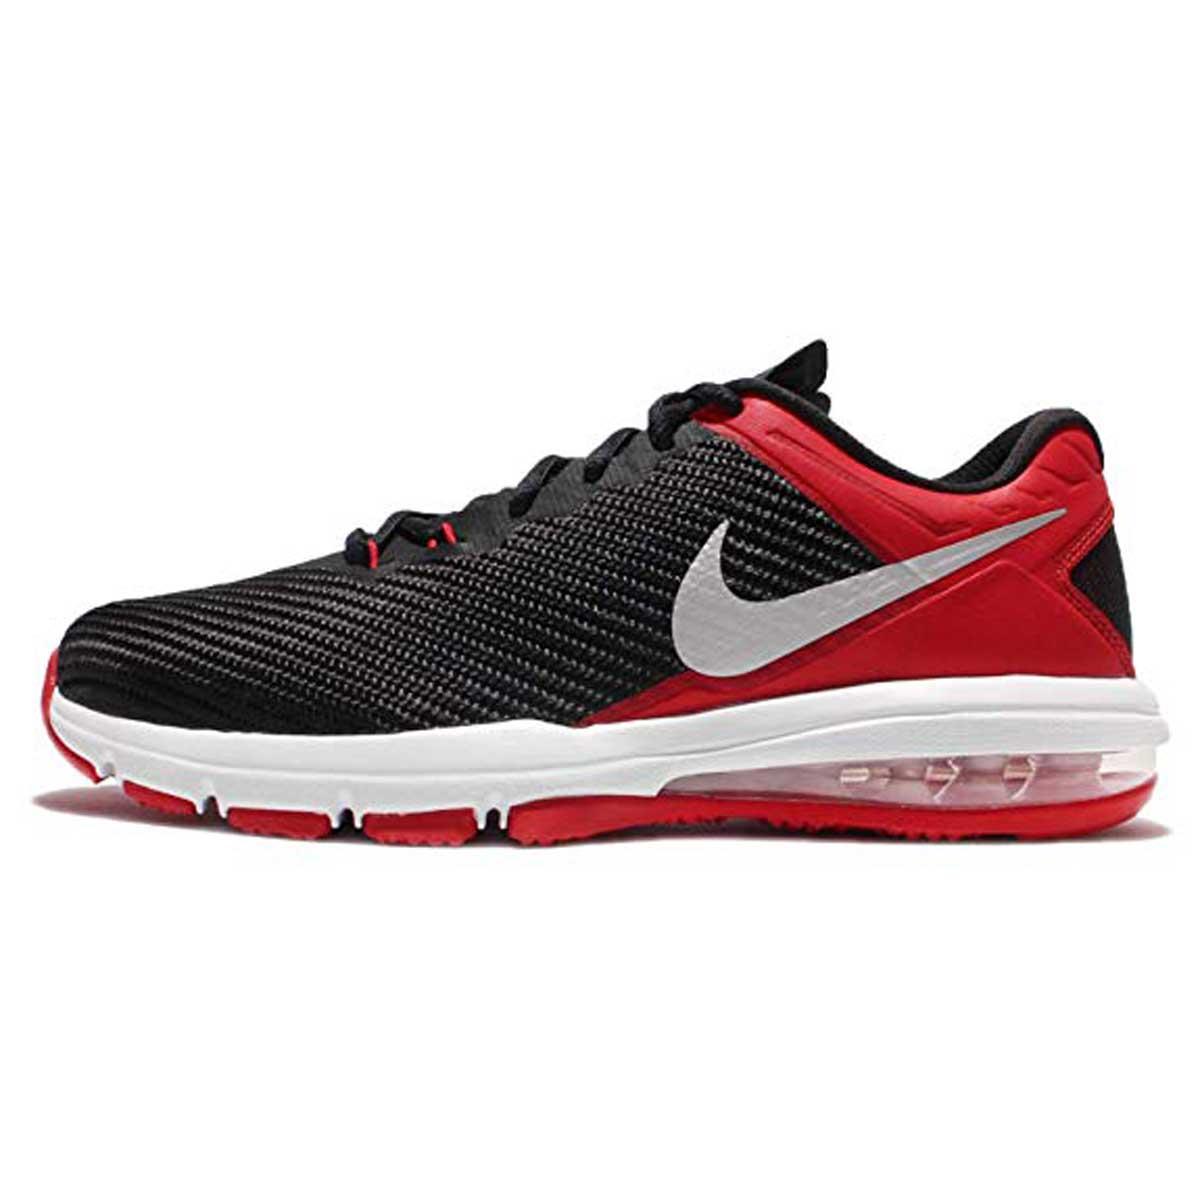 super popular 05a94 368e9 Buy Nike Air Max Full Ride 1.5 Mens Training Shoes Online